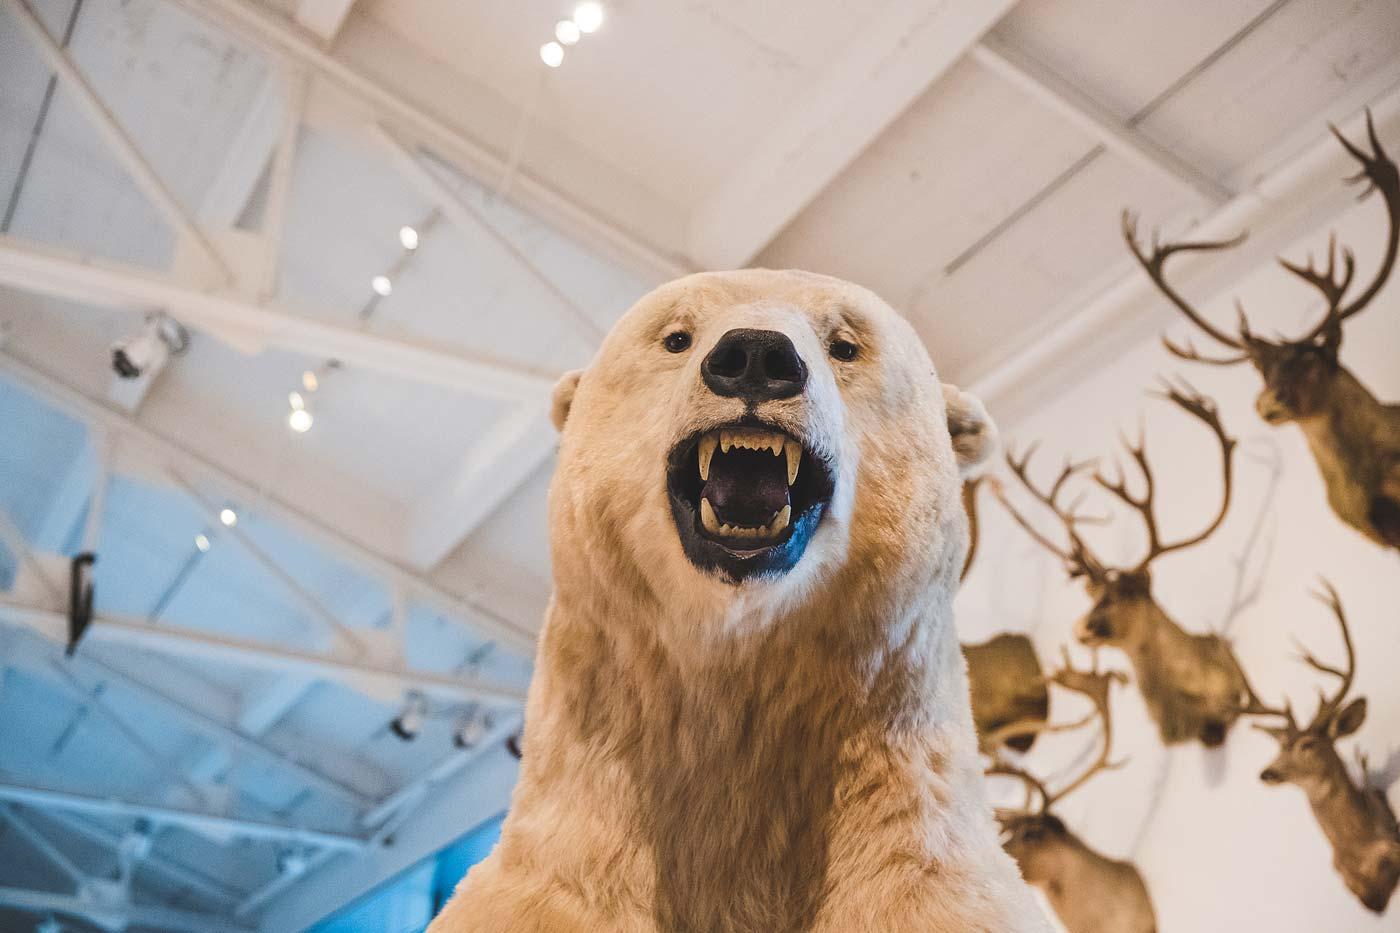 sNatural-History-Museum---Feb-2017-157.jpg